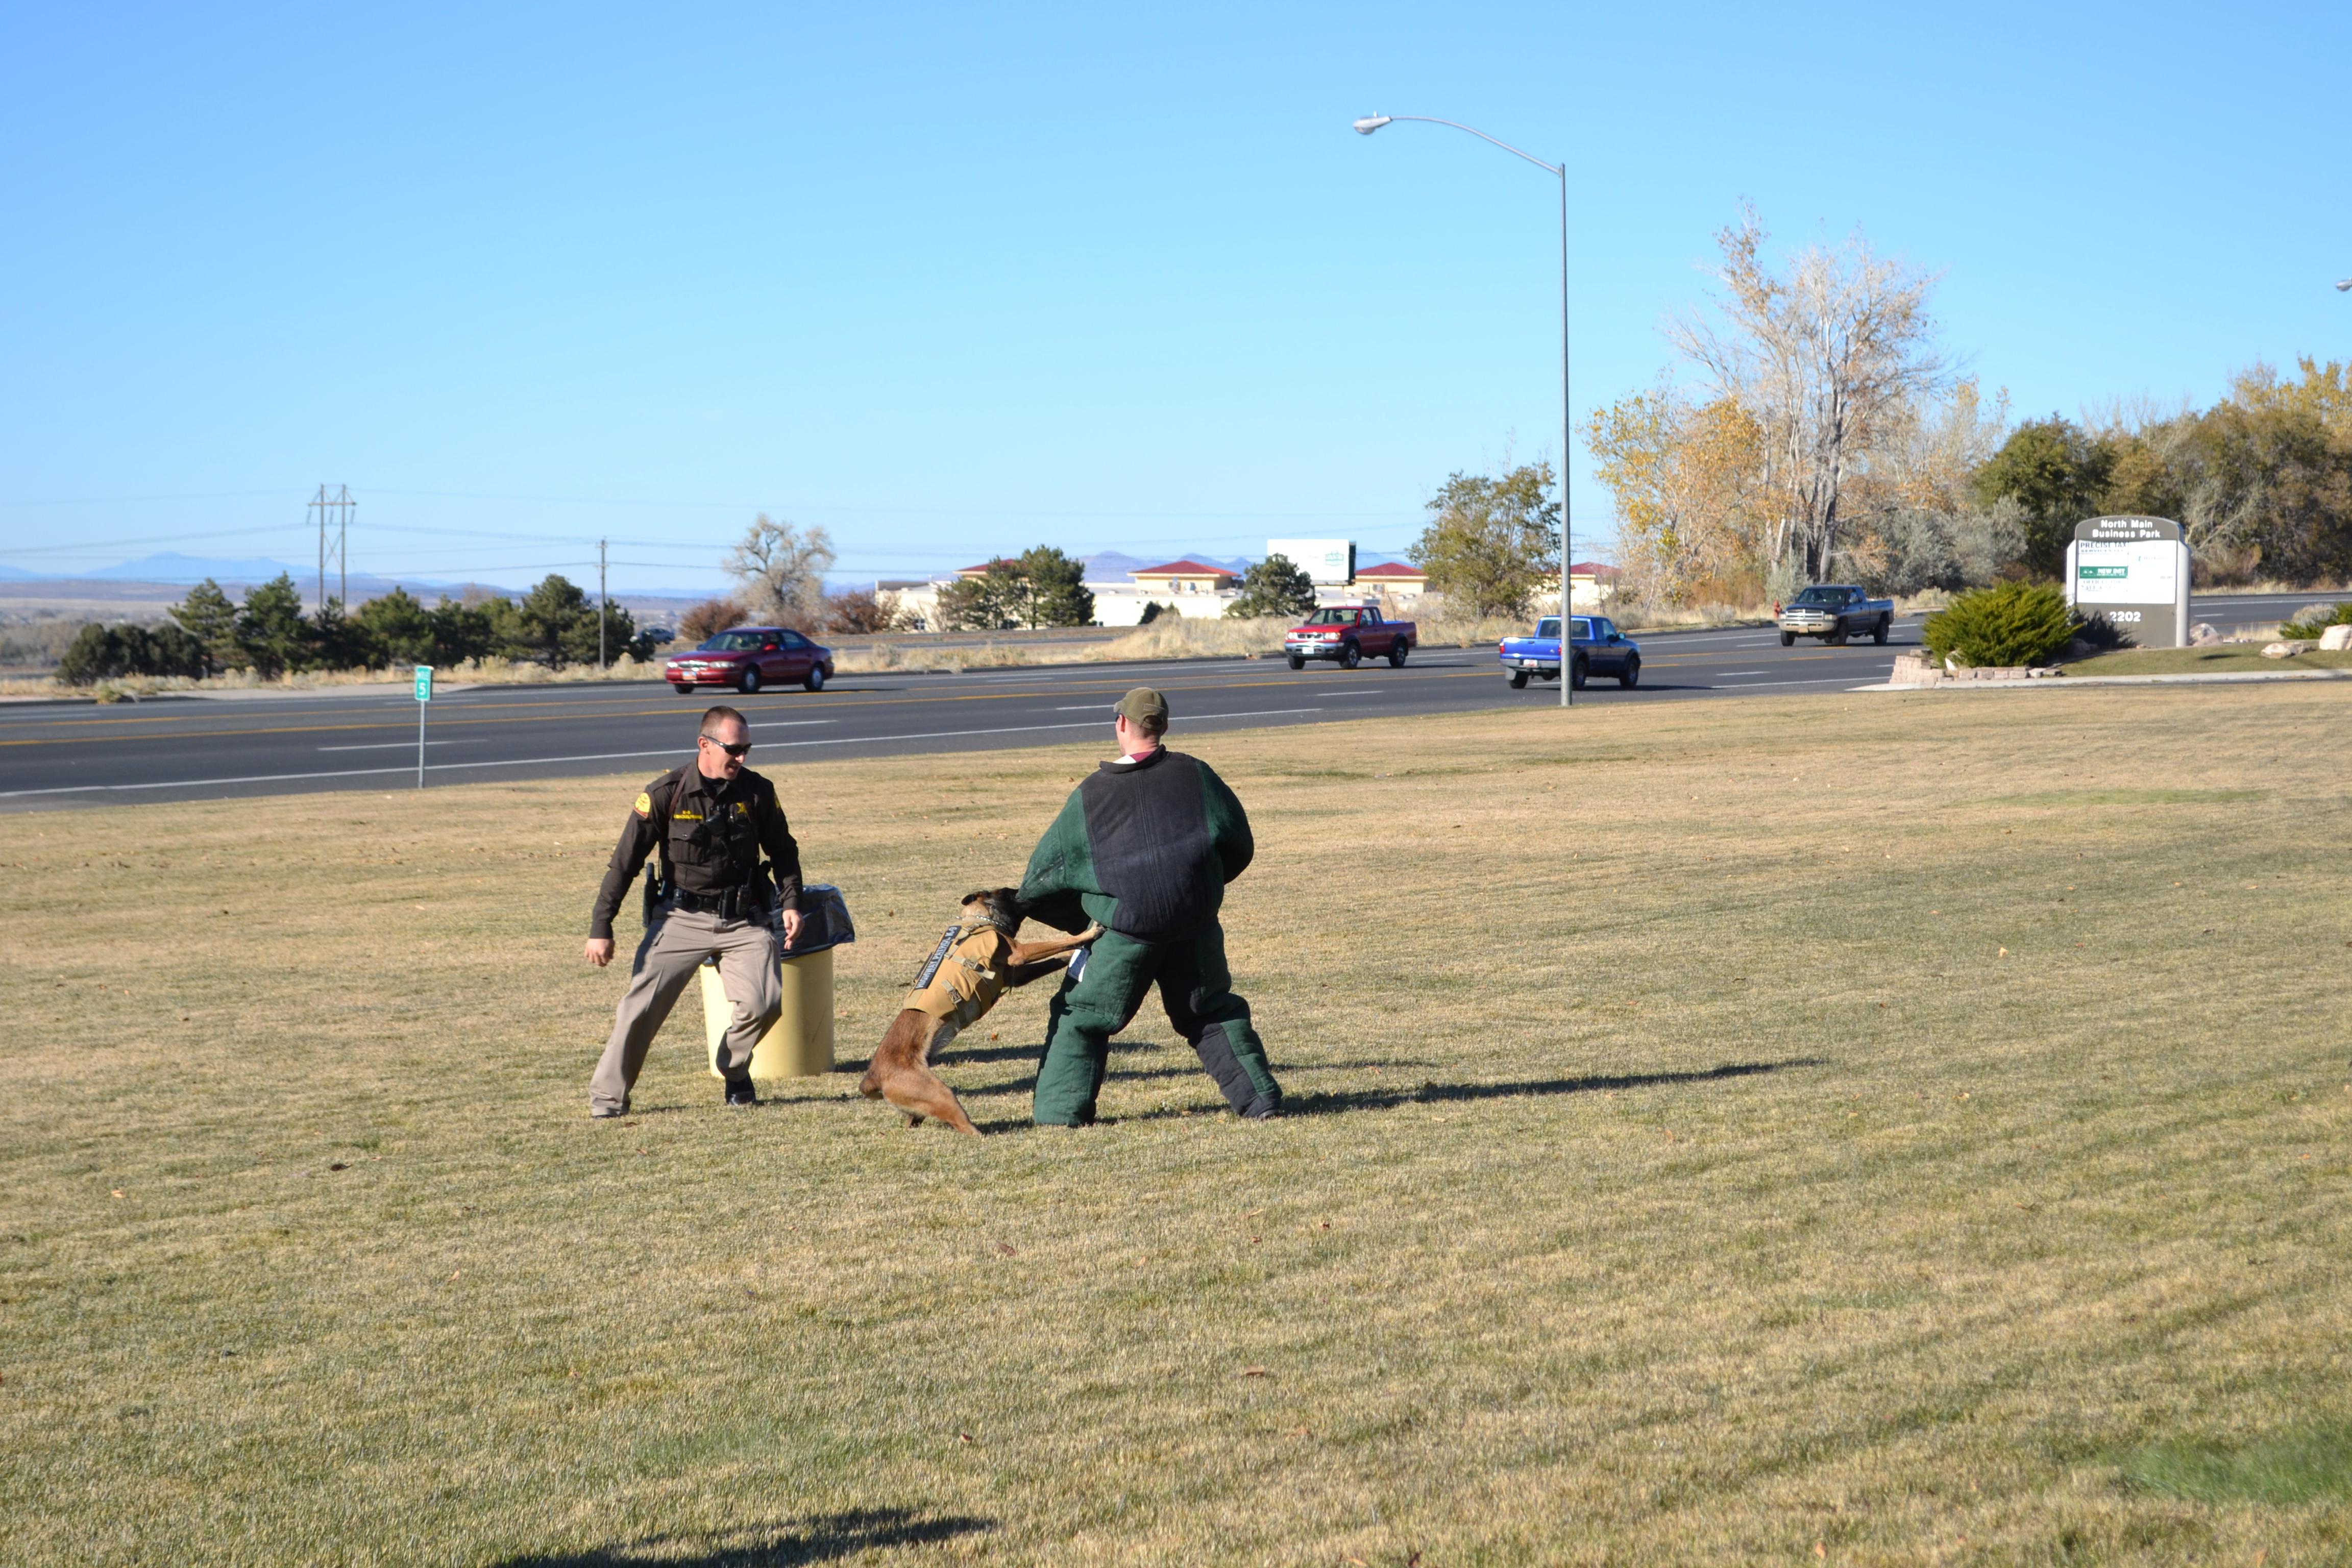 A police dog demonstrates training, Cedar City, Utah, Nov. 13, 2015 | Photo by Emily Hammer, St. George News